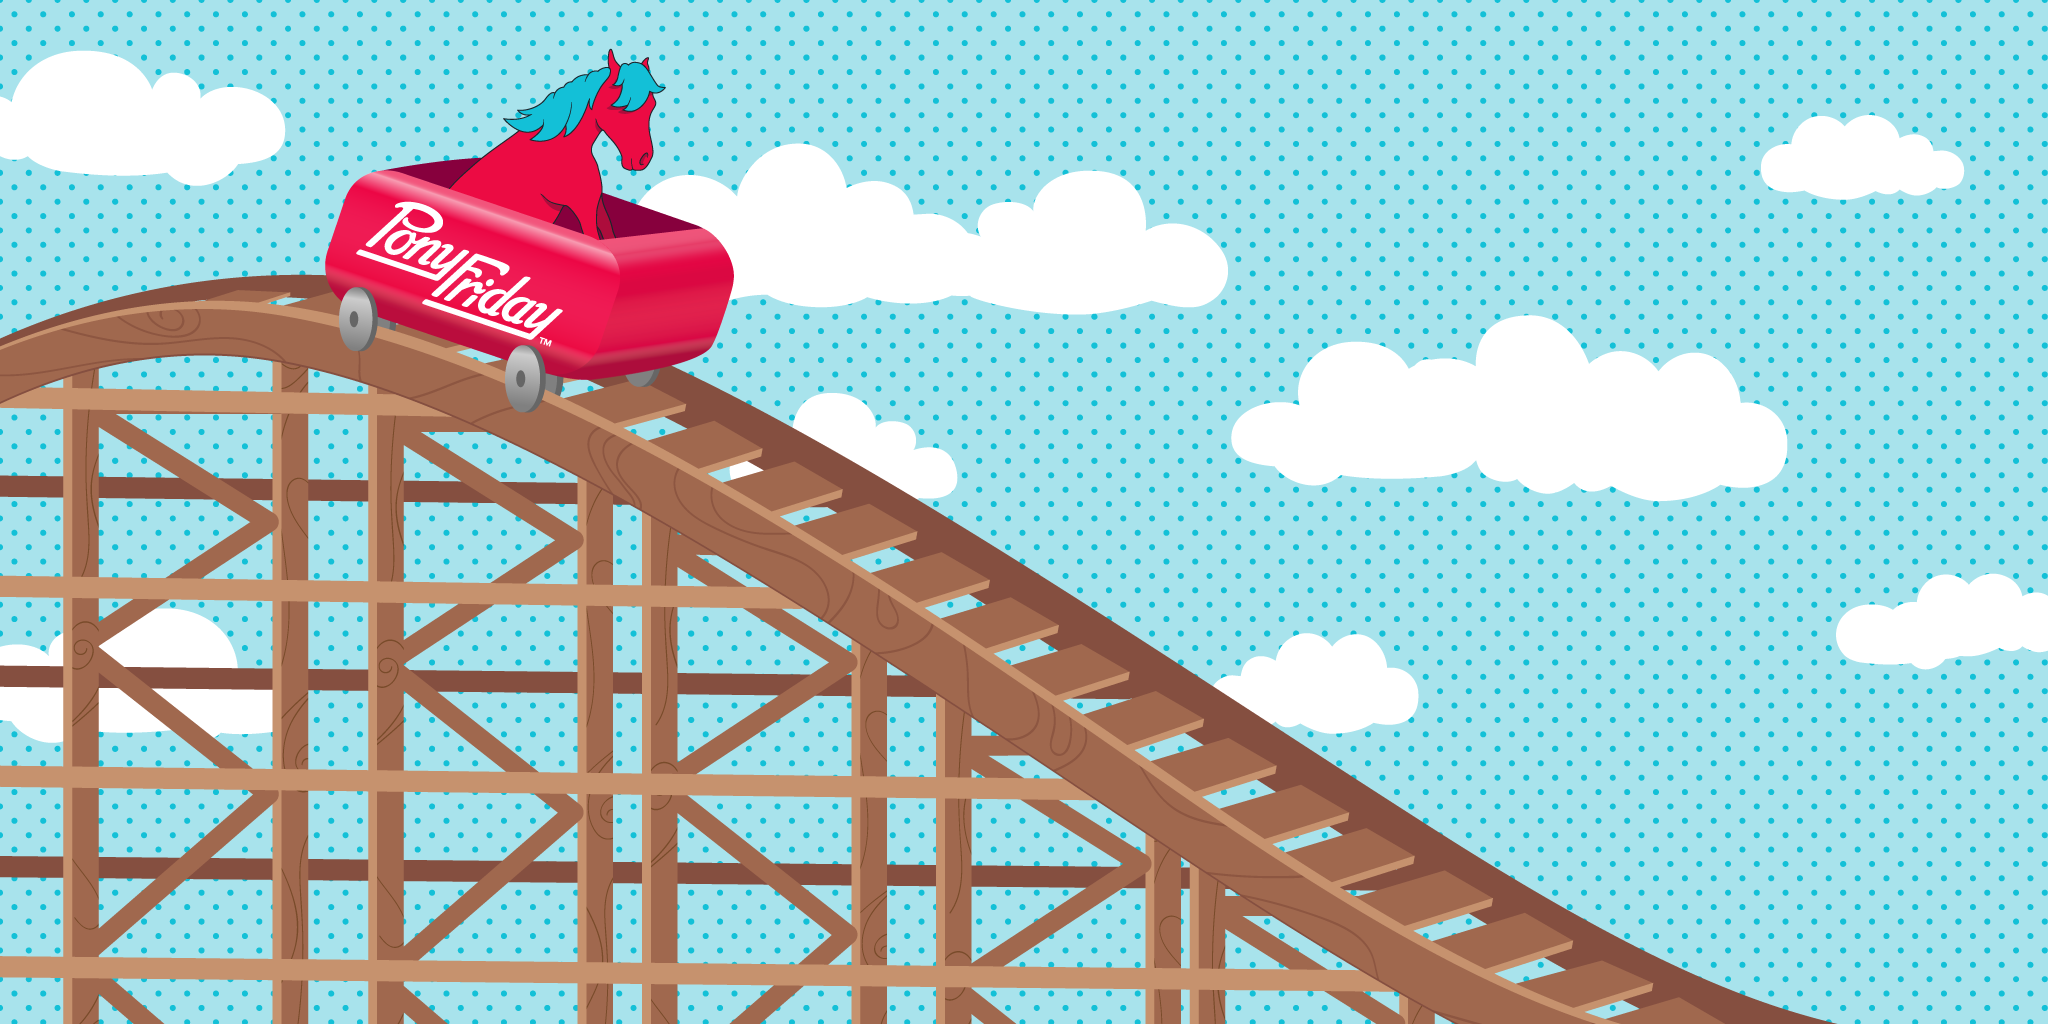 Pony-Friday-Roller-Coaster-Spring-Pony-Cart-Wood-Sky-Clouds-Fun-Happy-Joyride-Kicks-Blog-Header.png